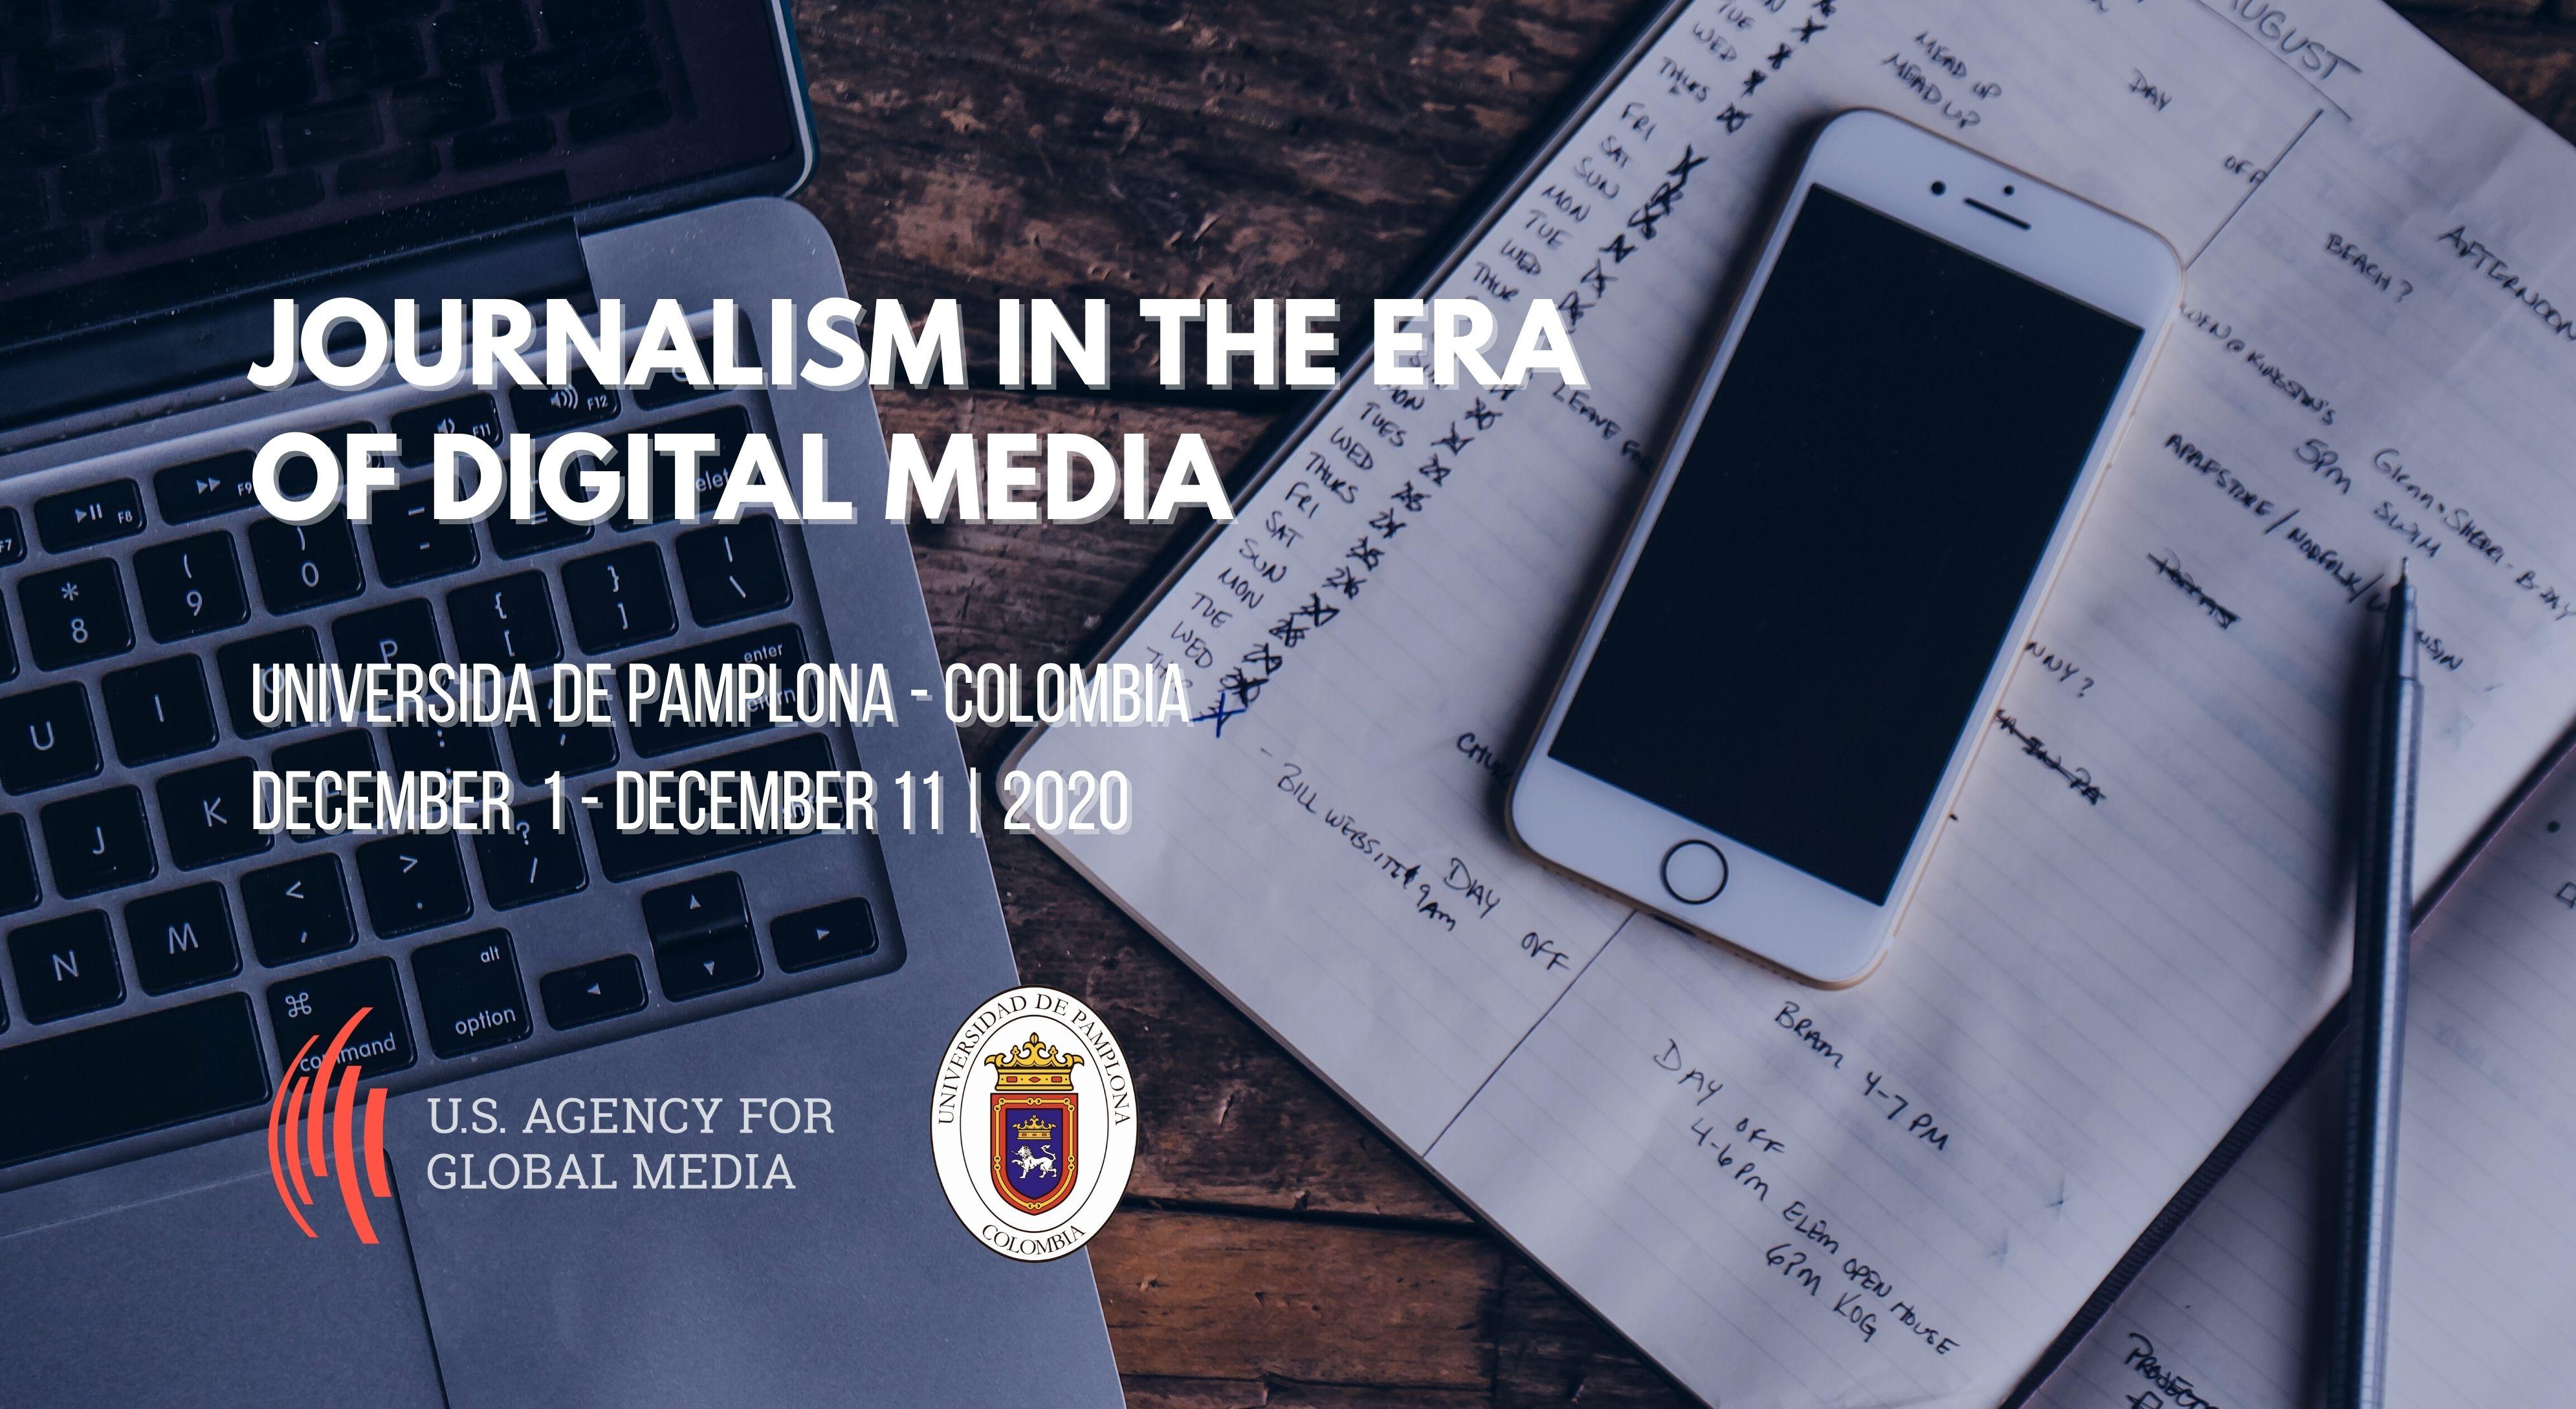 Colombia: Journalism in the Era of Digital Media